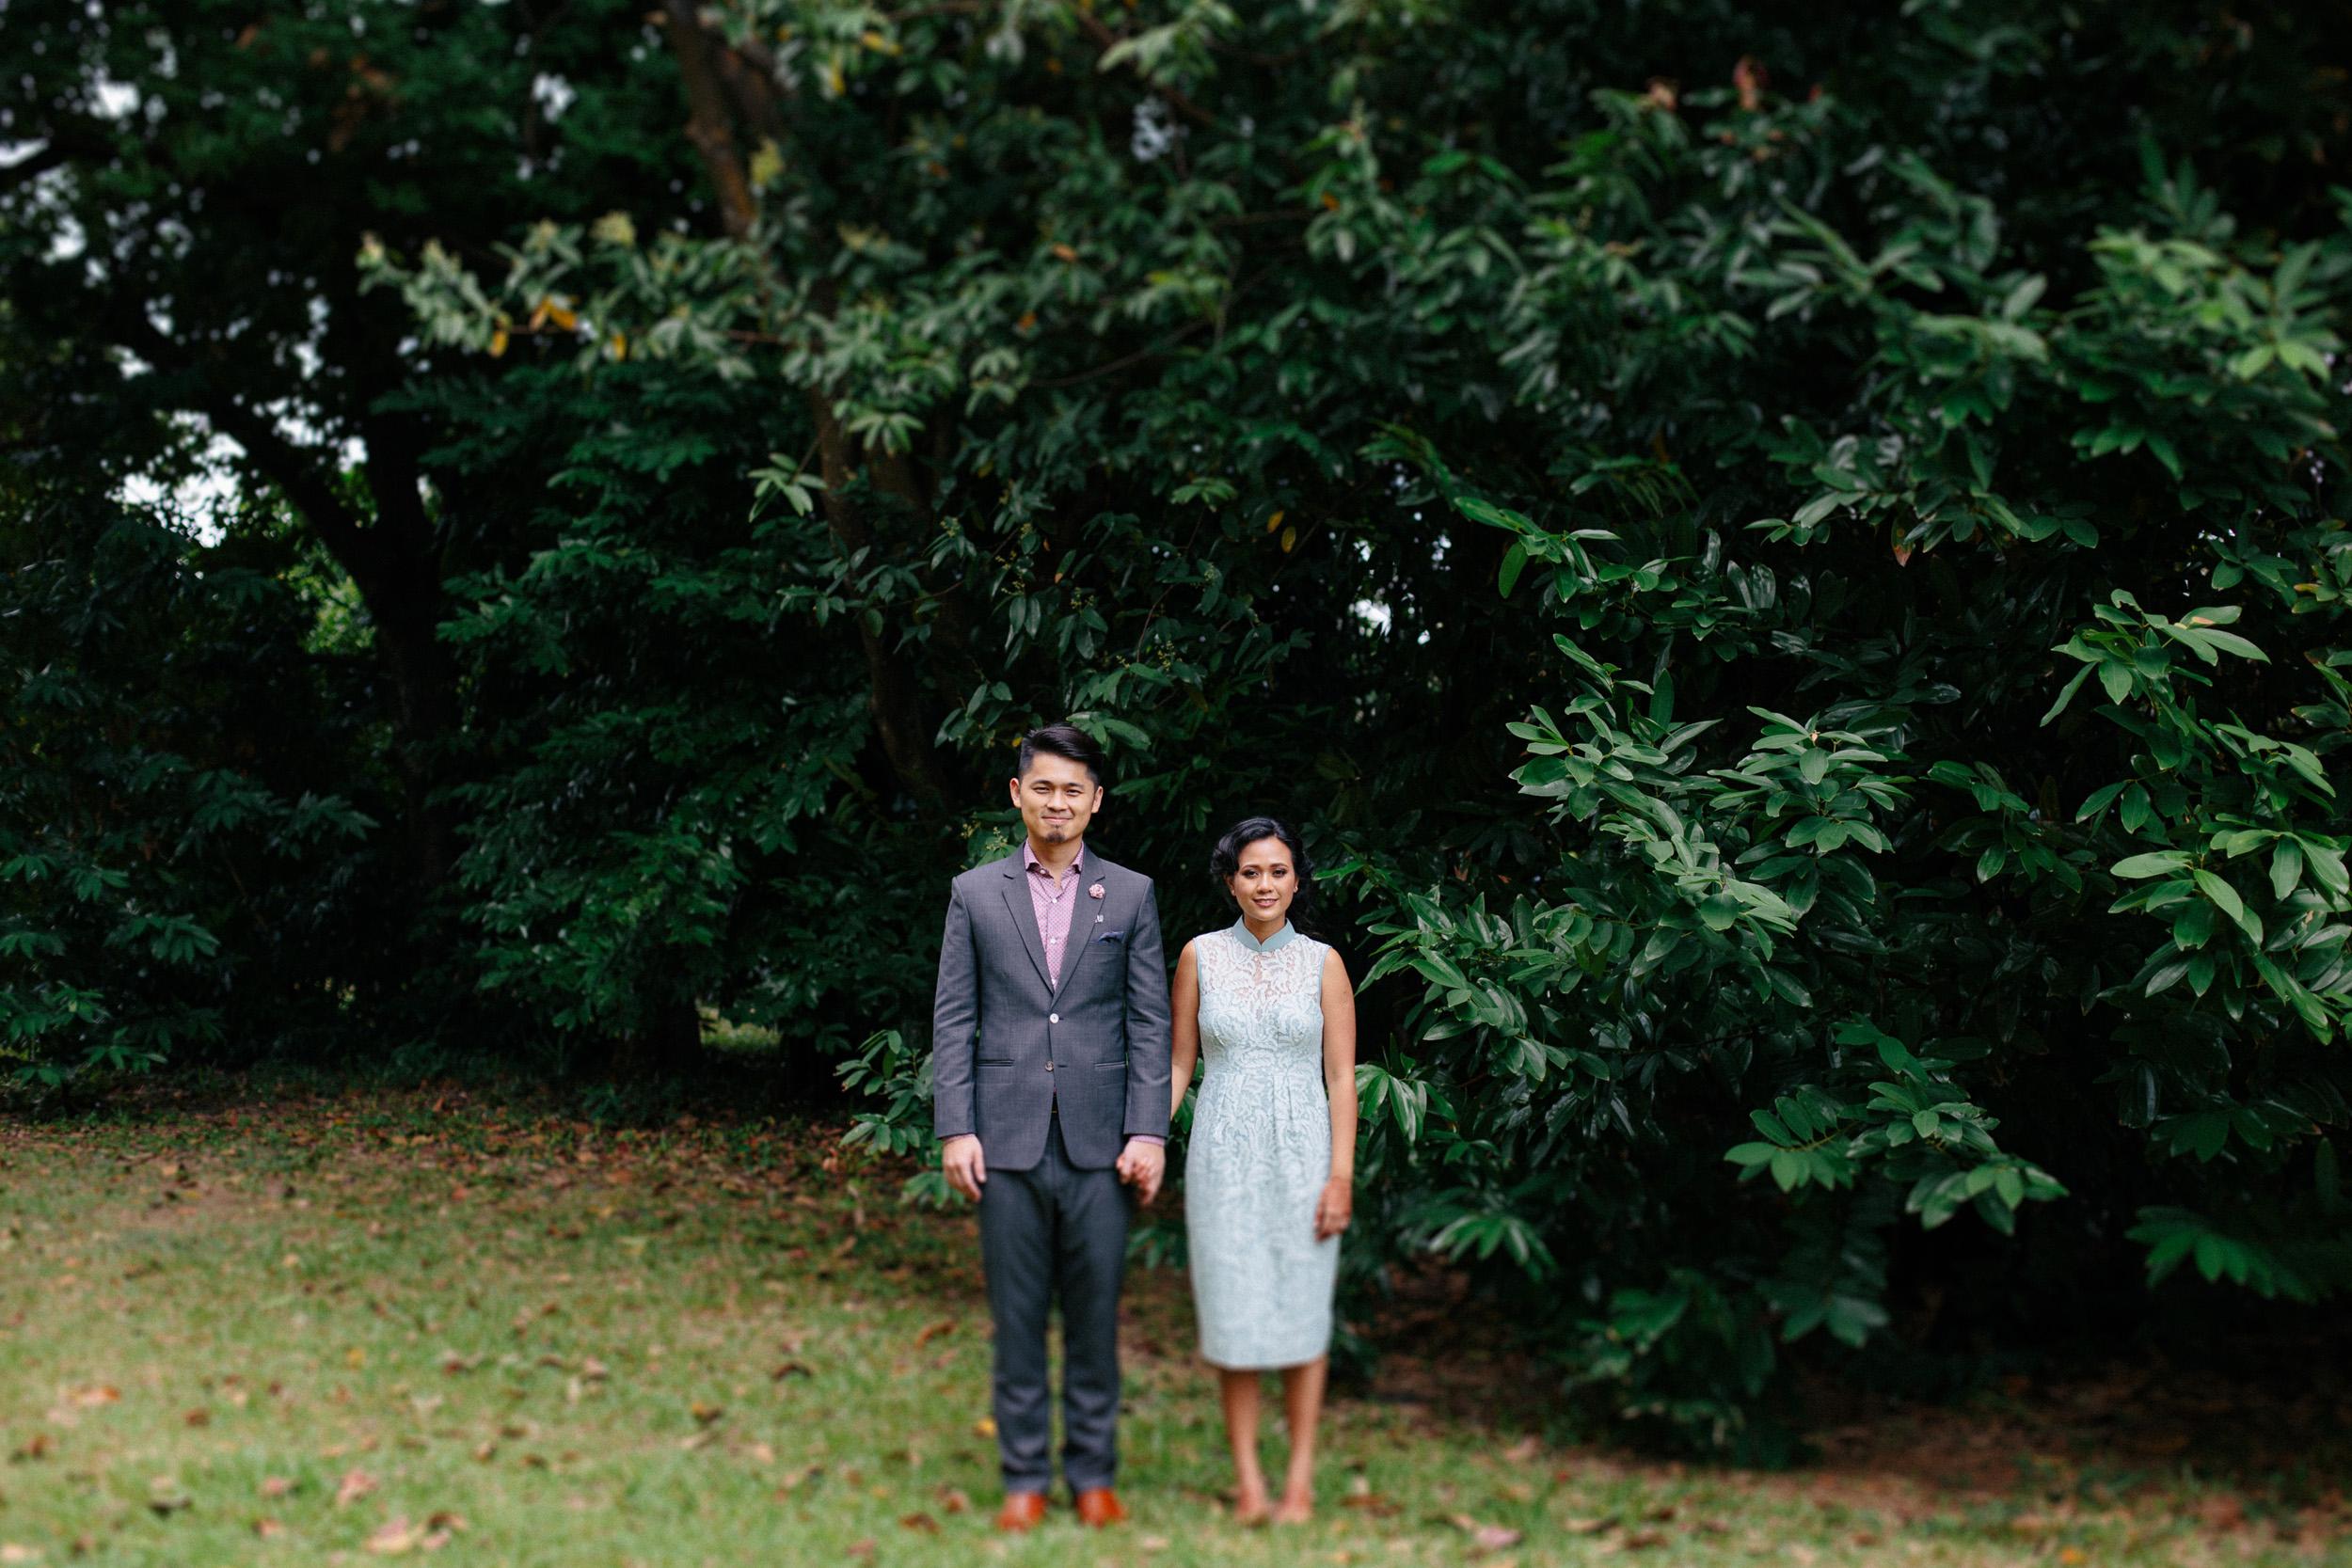 singapore-wedding-photographer-photography-wmt2017-036.jpg